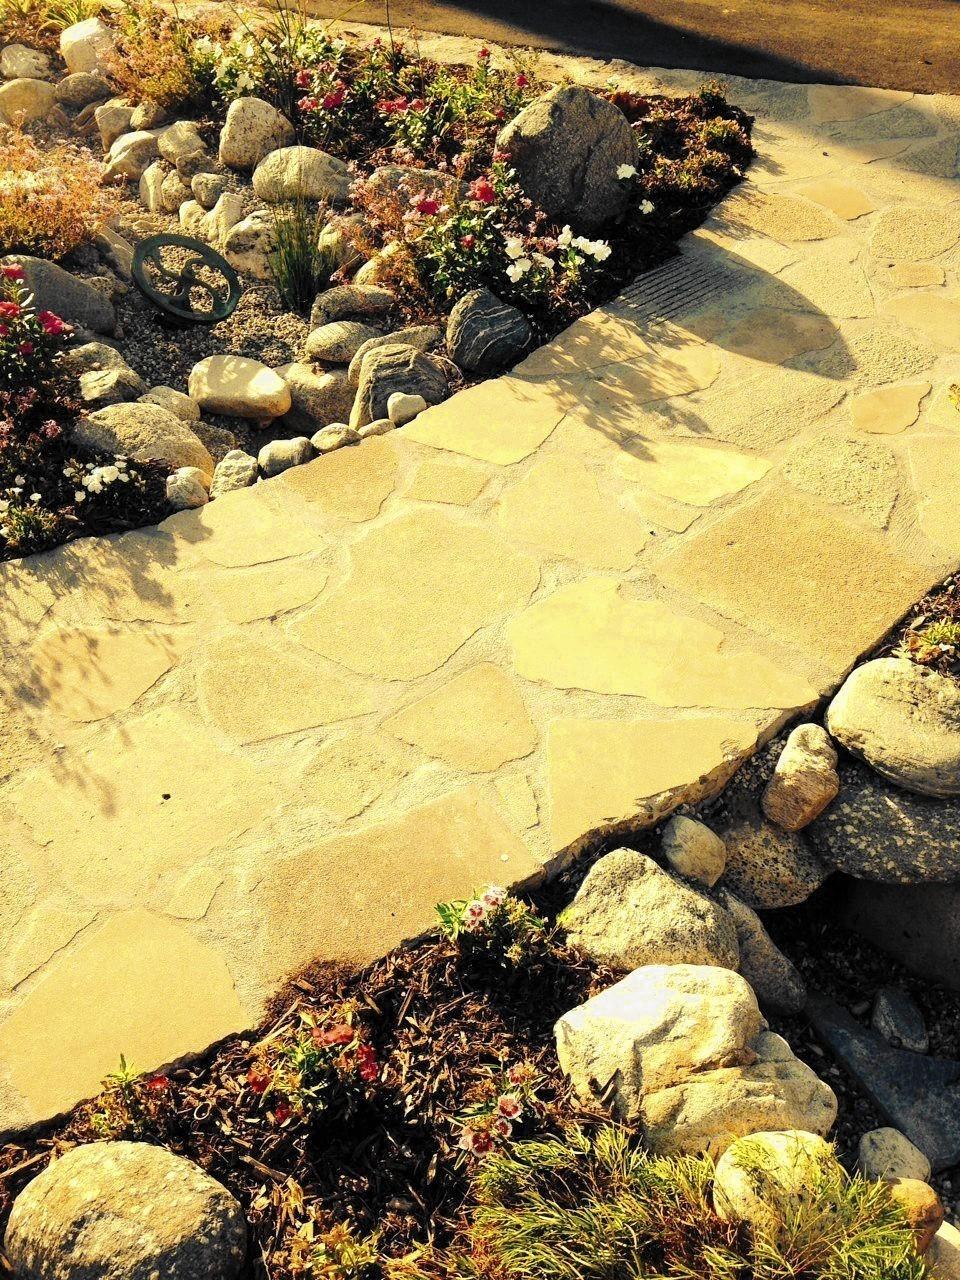 Reusing broken concrete isn't too hard - LA Times